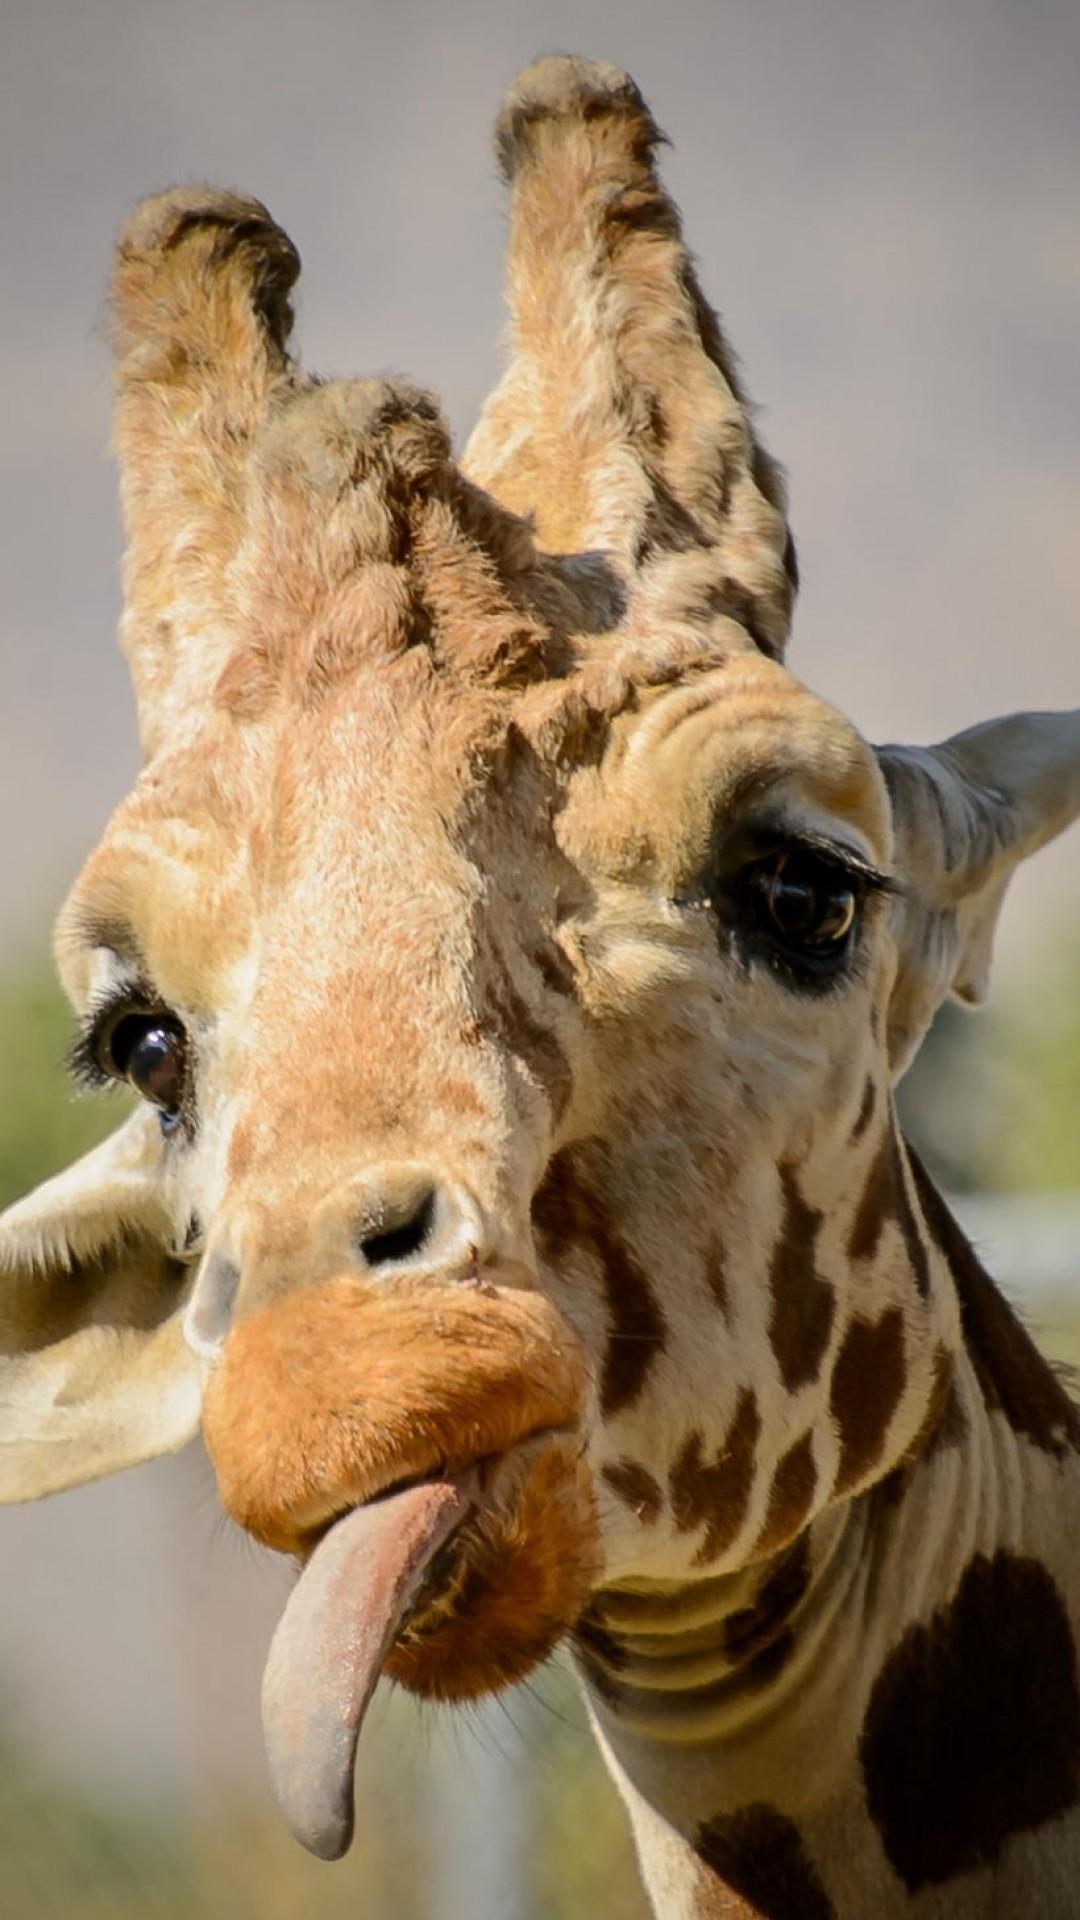 Free Funny Giraffe phone wallpaper by mboy06